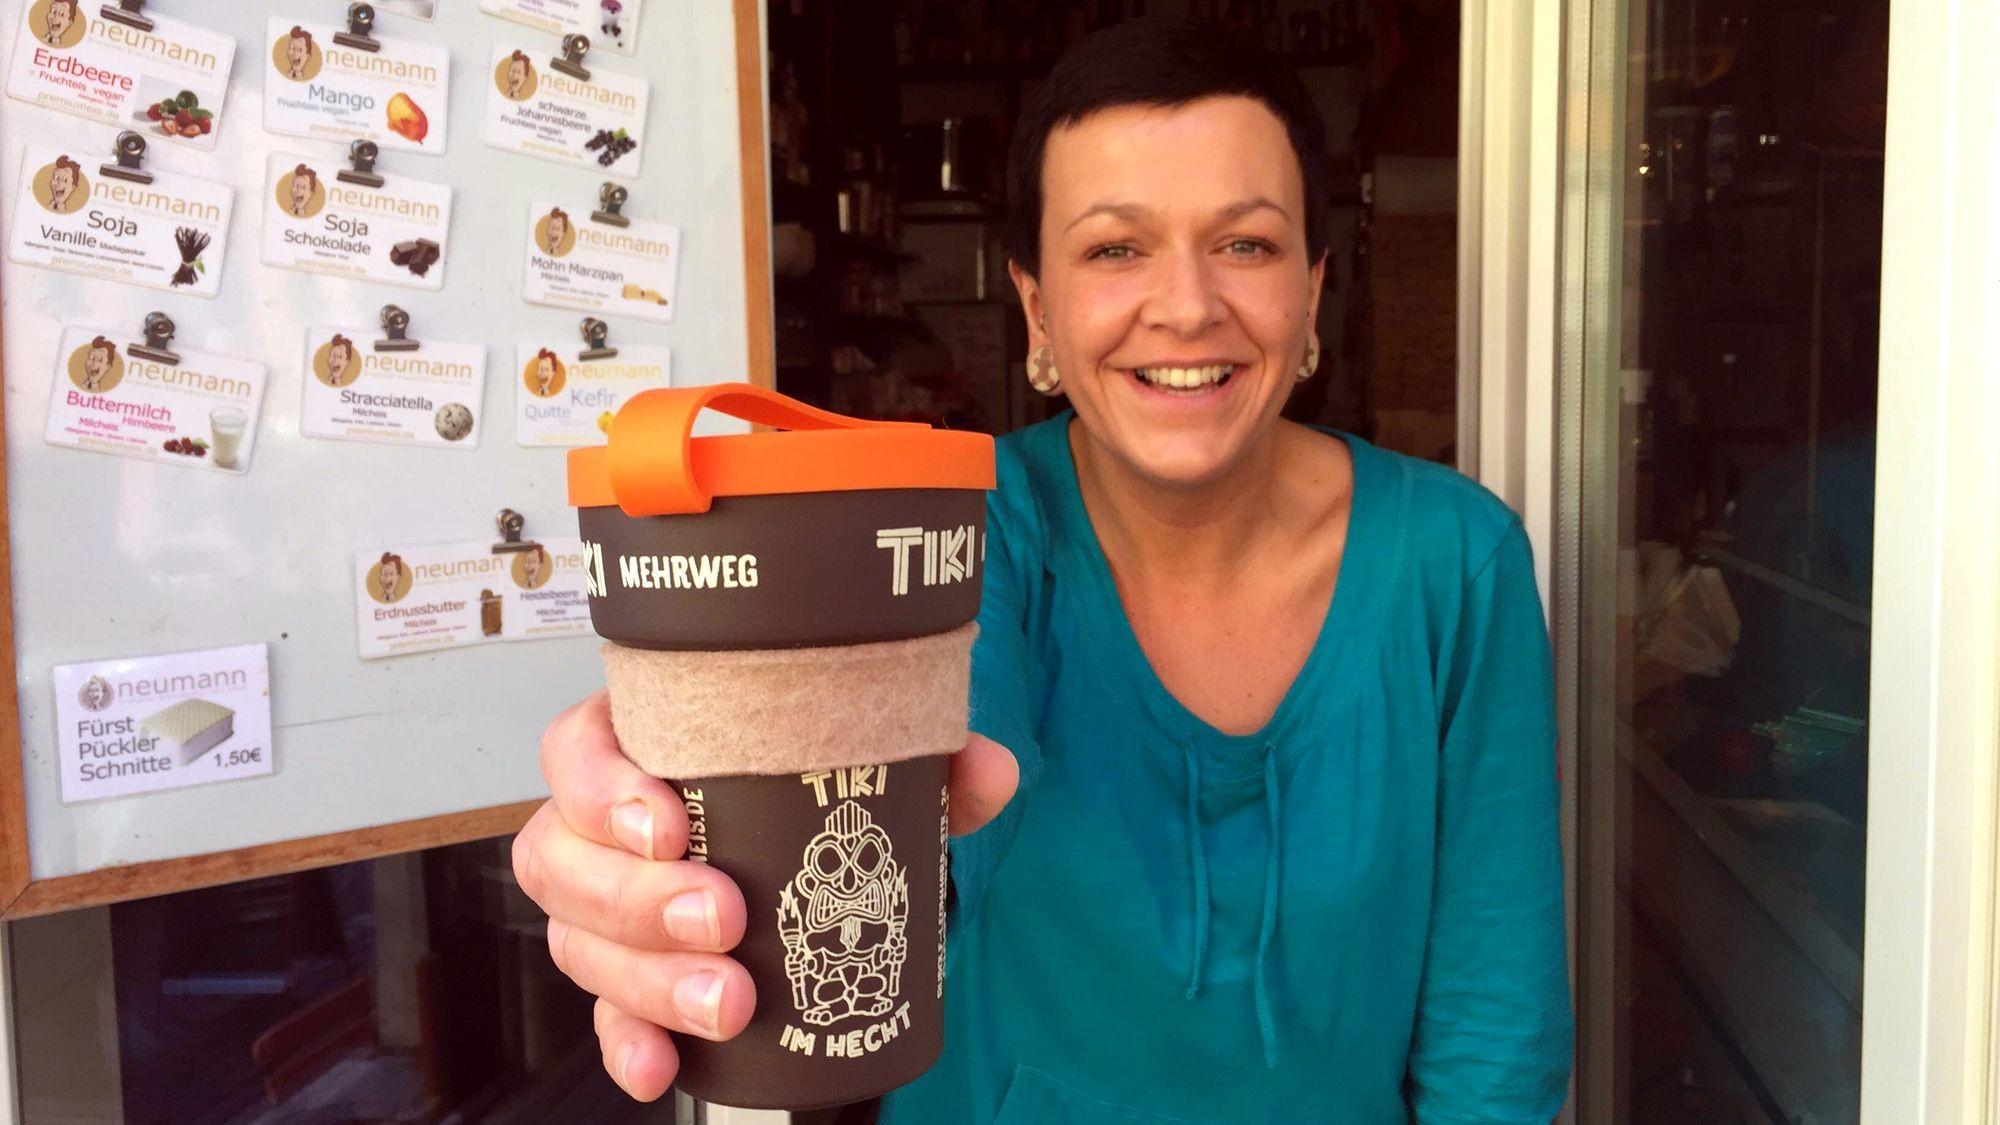 Verkäuferin Antje präsentiert den Becher